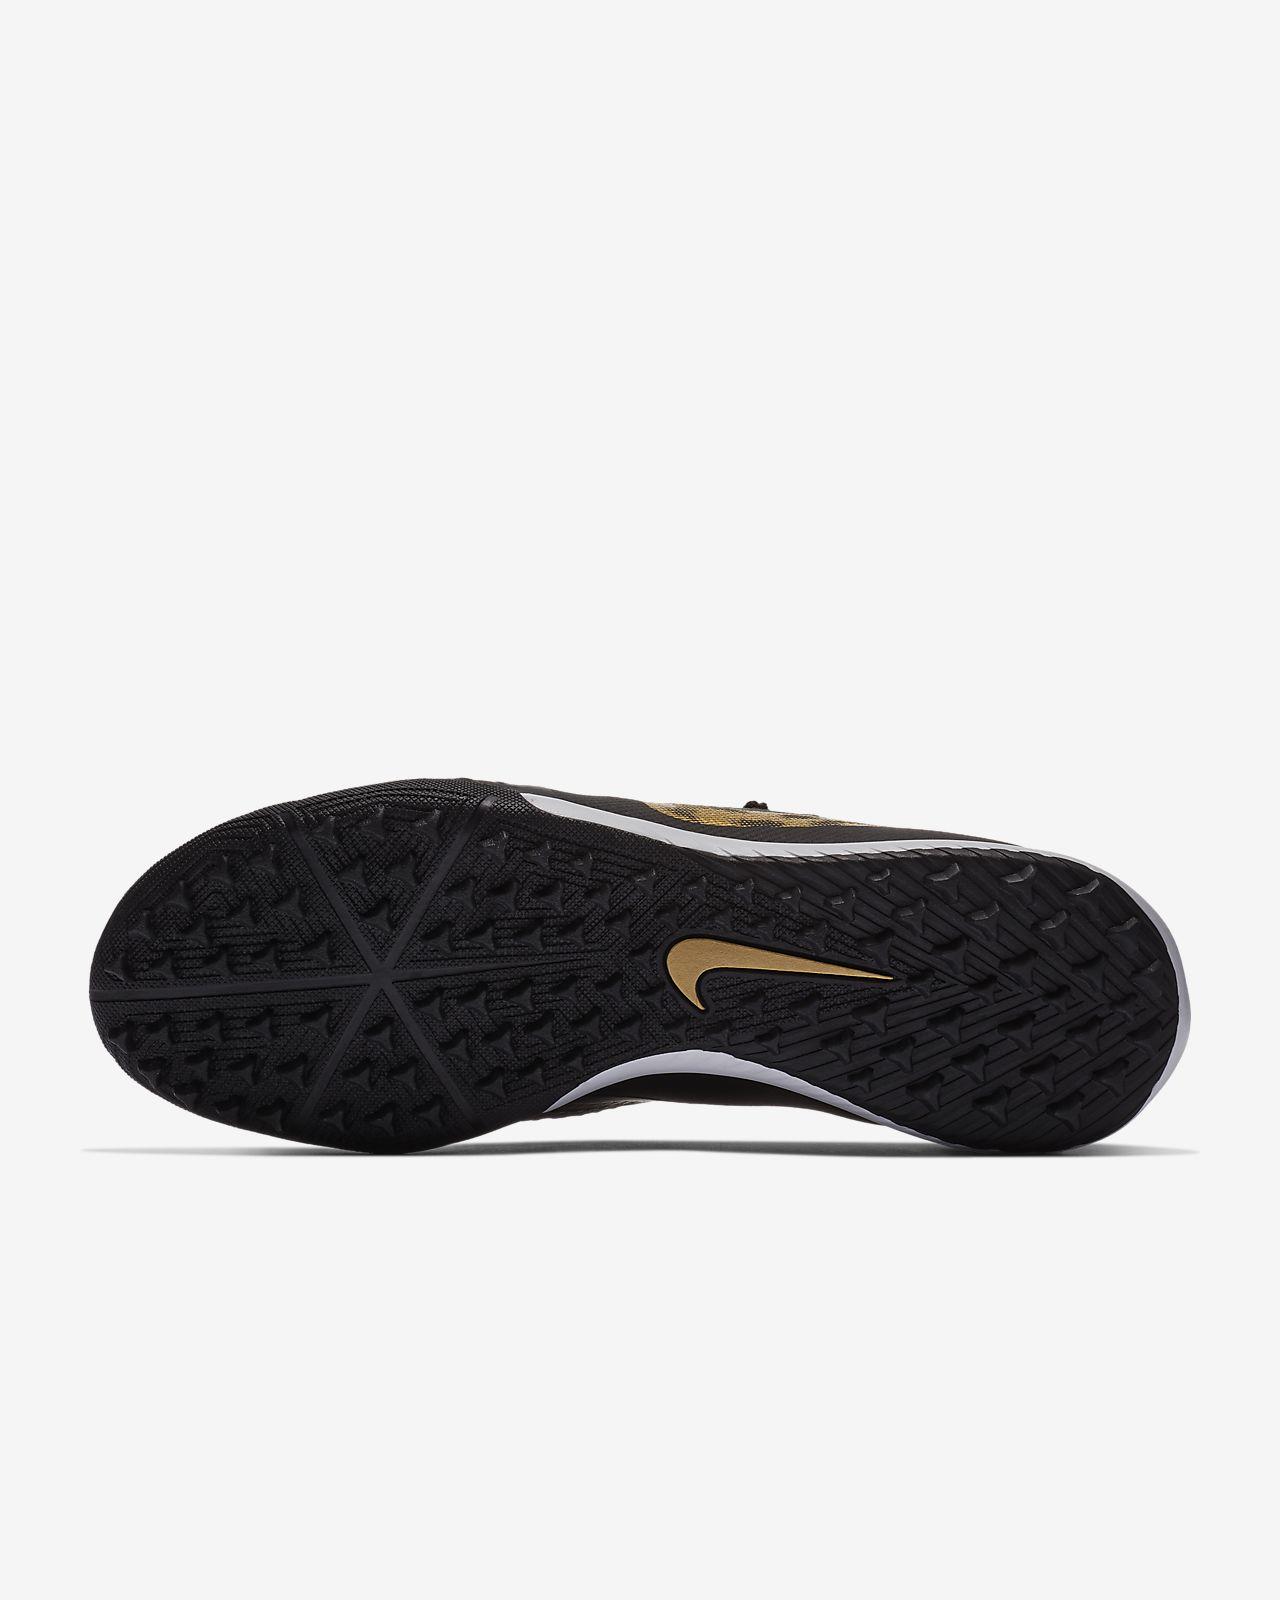 Nike PhantomVNM Academy TF Game Over Turf Football Shoe